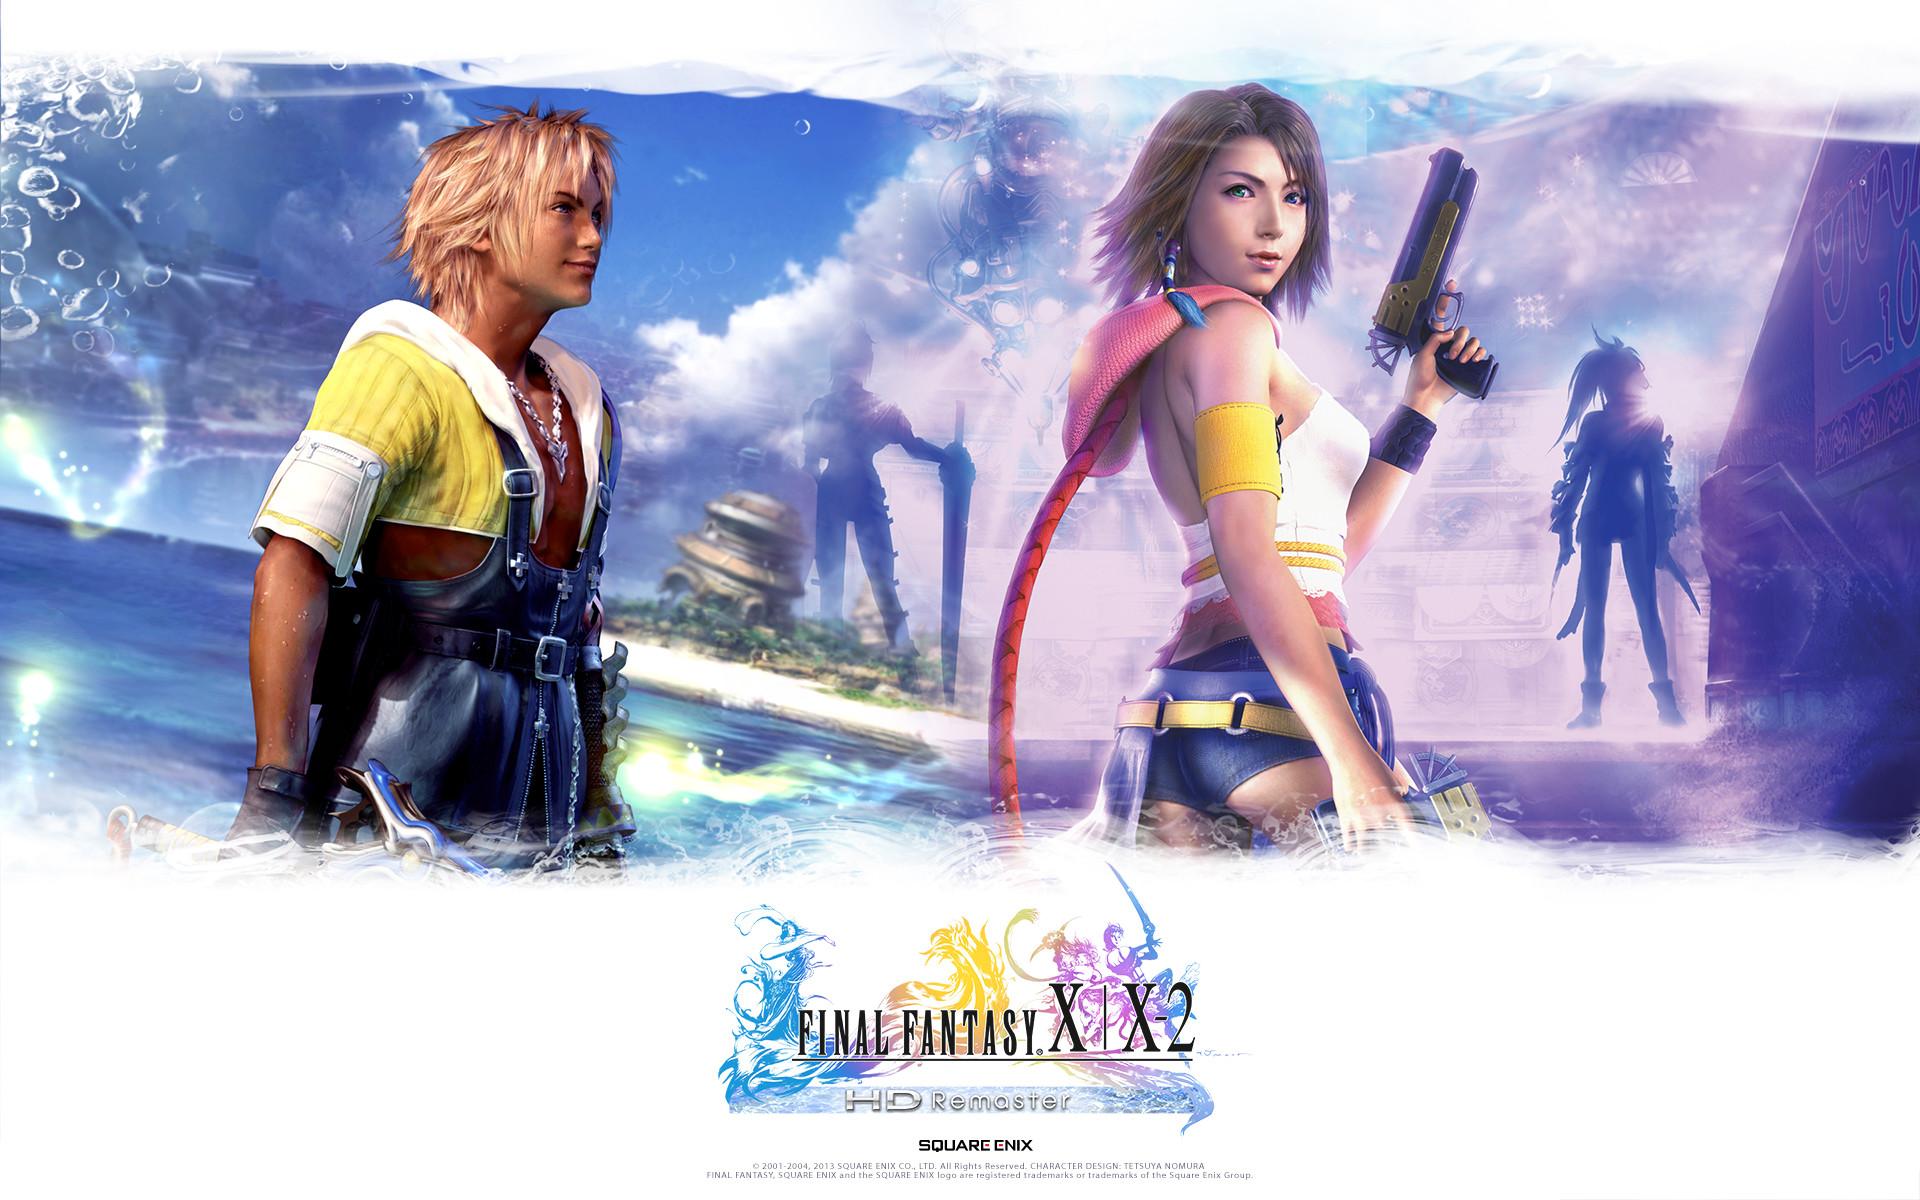 Final Fantasy X/X-2 HD Remaster wallpapers | Final Fantasy Wiki | FANDOM  powered by Wikia